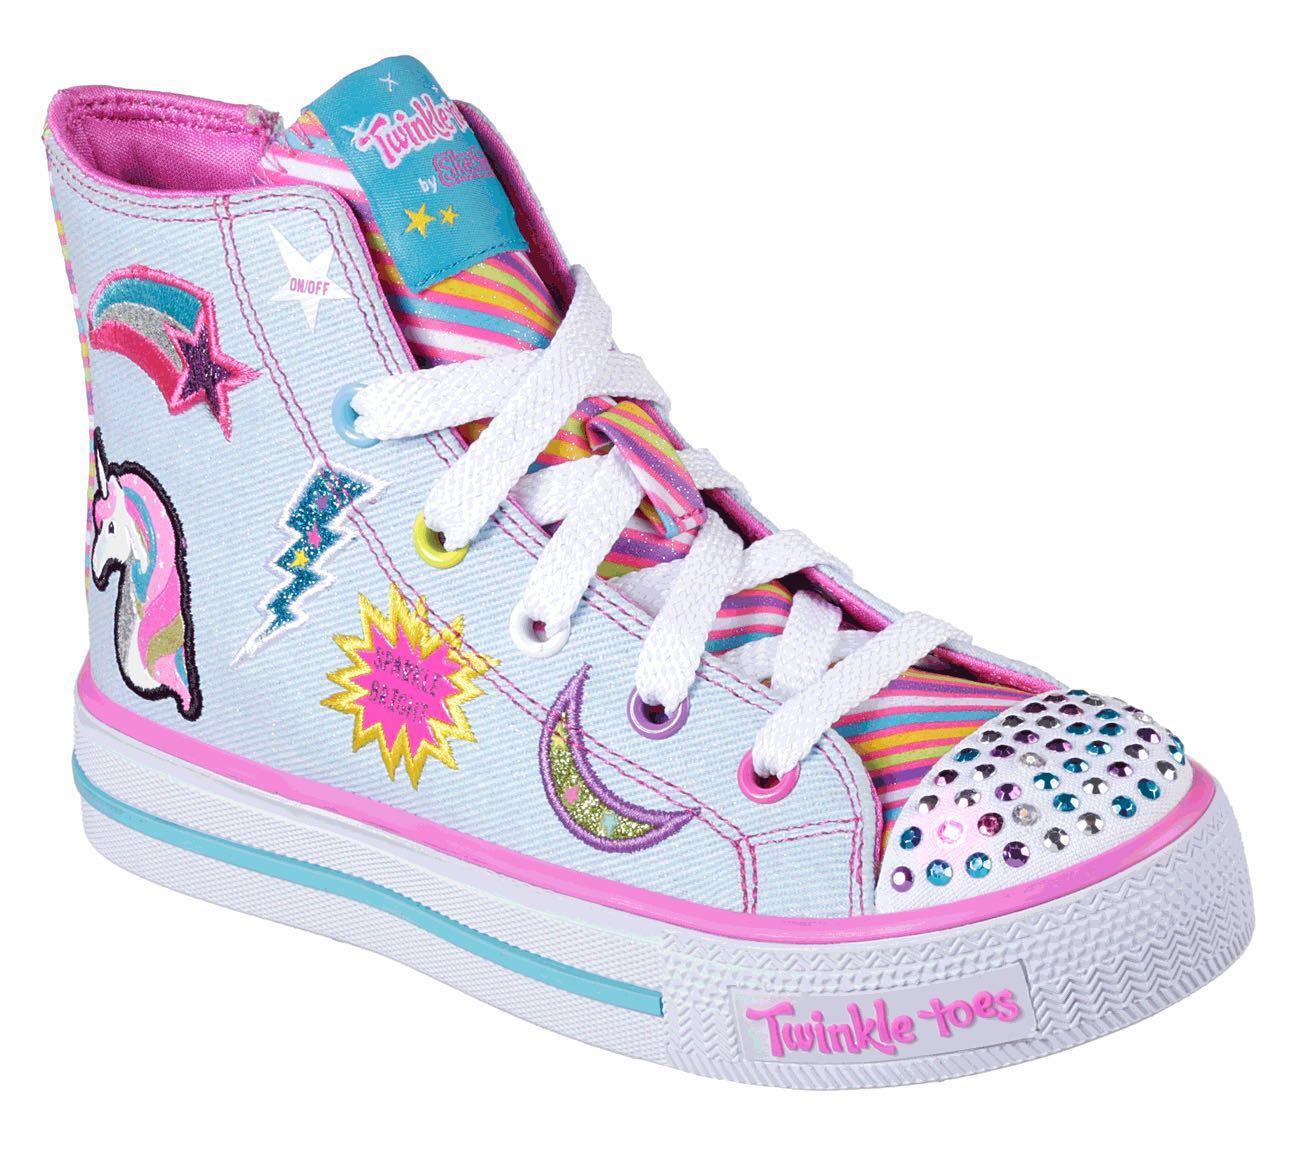 01ea2a9d3212e SKECHERS Twinkle Toes, Babies & Kids, Girls' Apparel, 8 to 12 Years ...